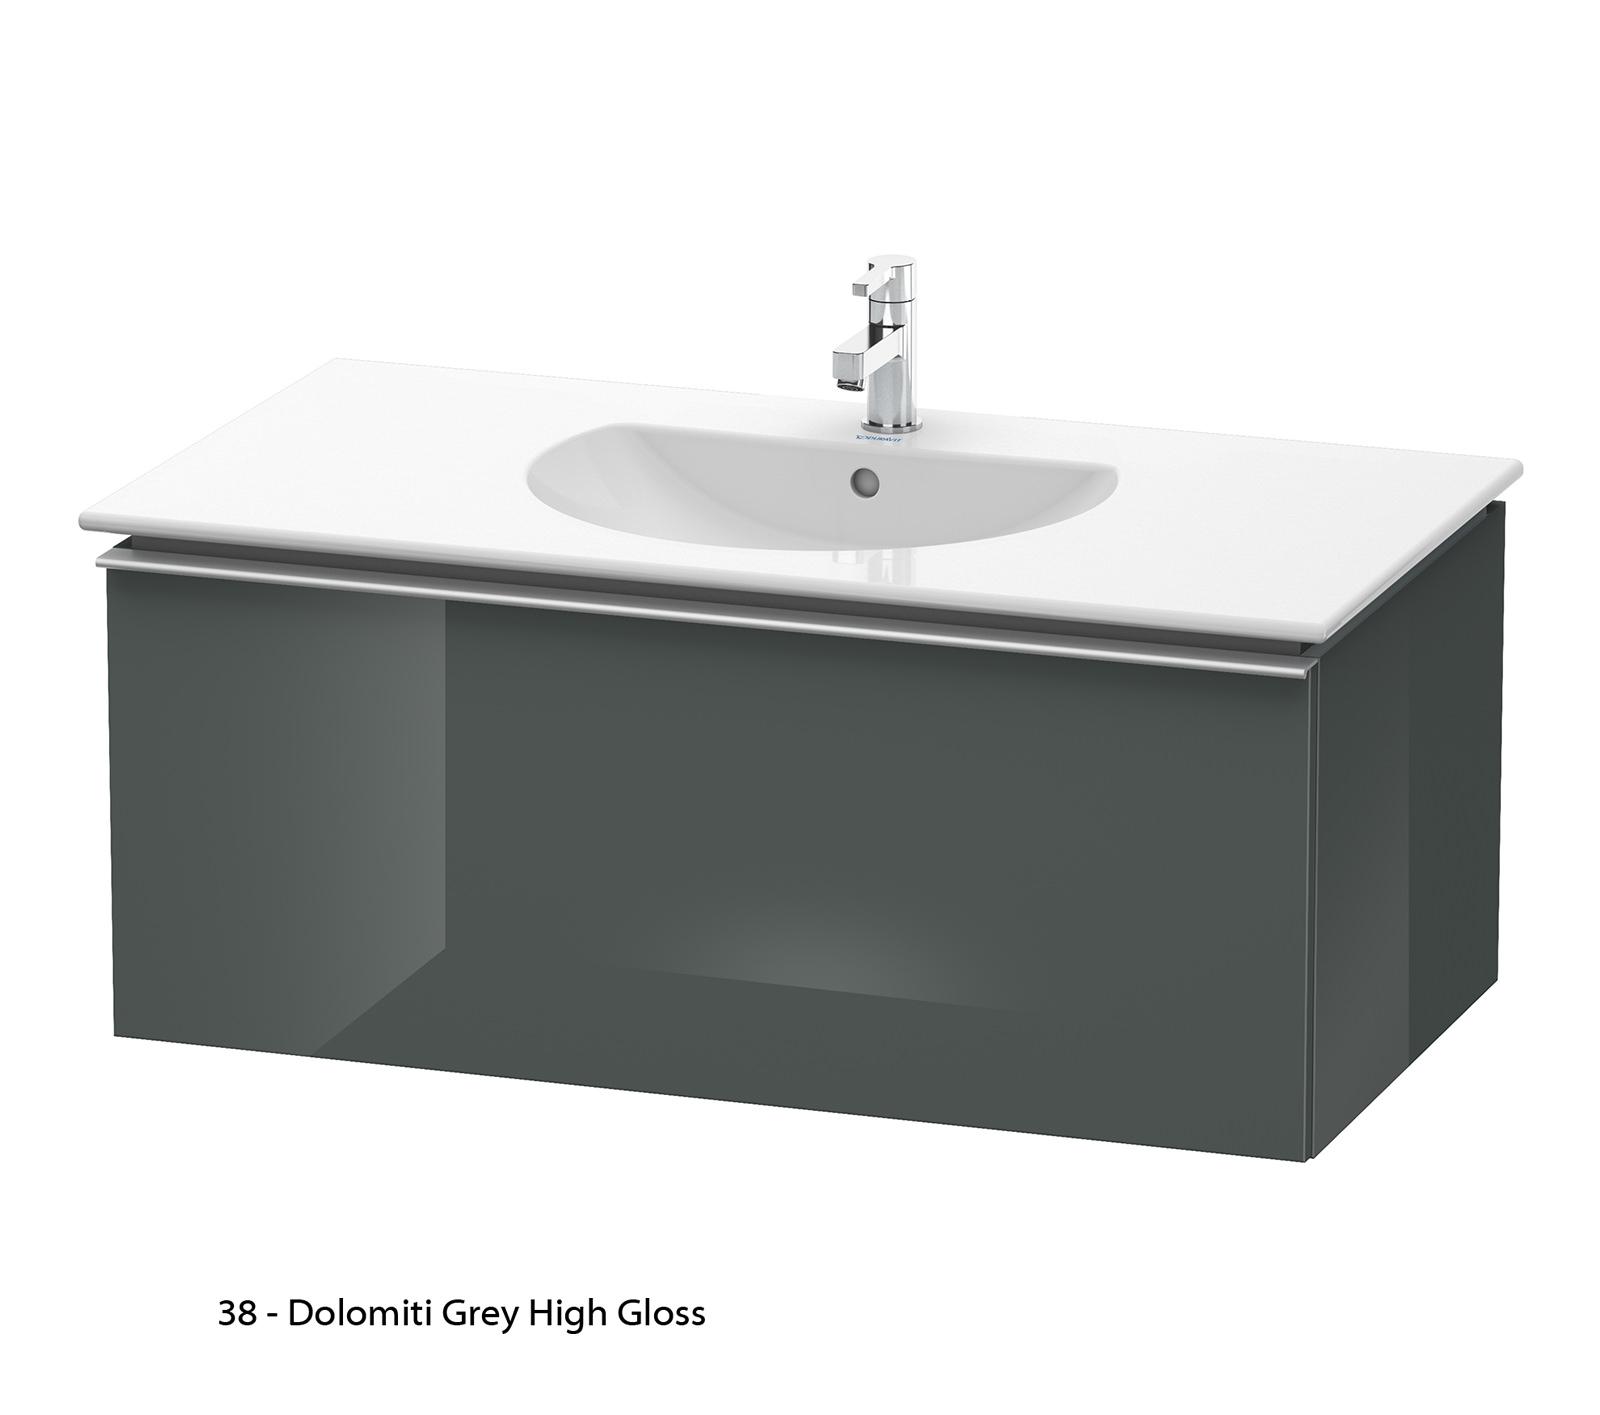 Duravit darling new 1000mm wall mounted basin vanity unit - Duravit bathroom furniture uk ...